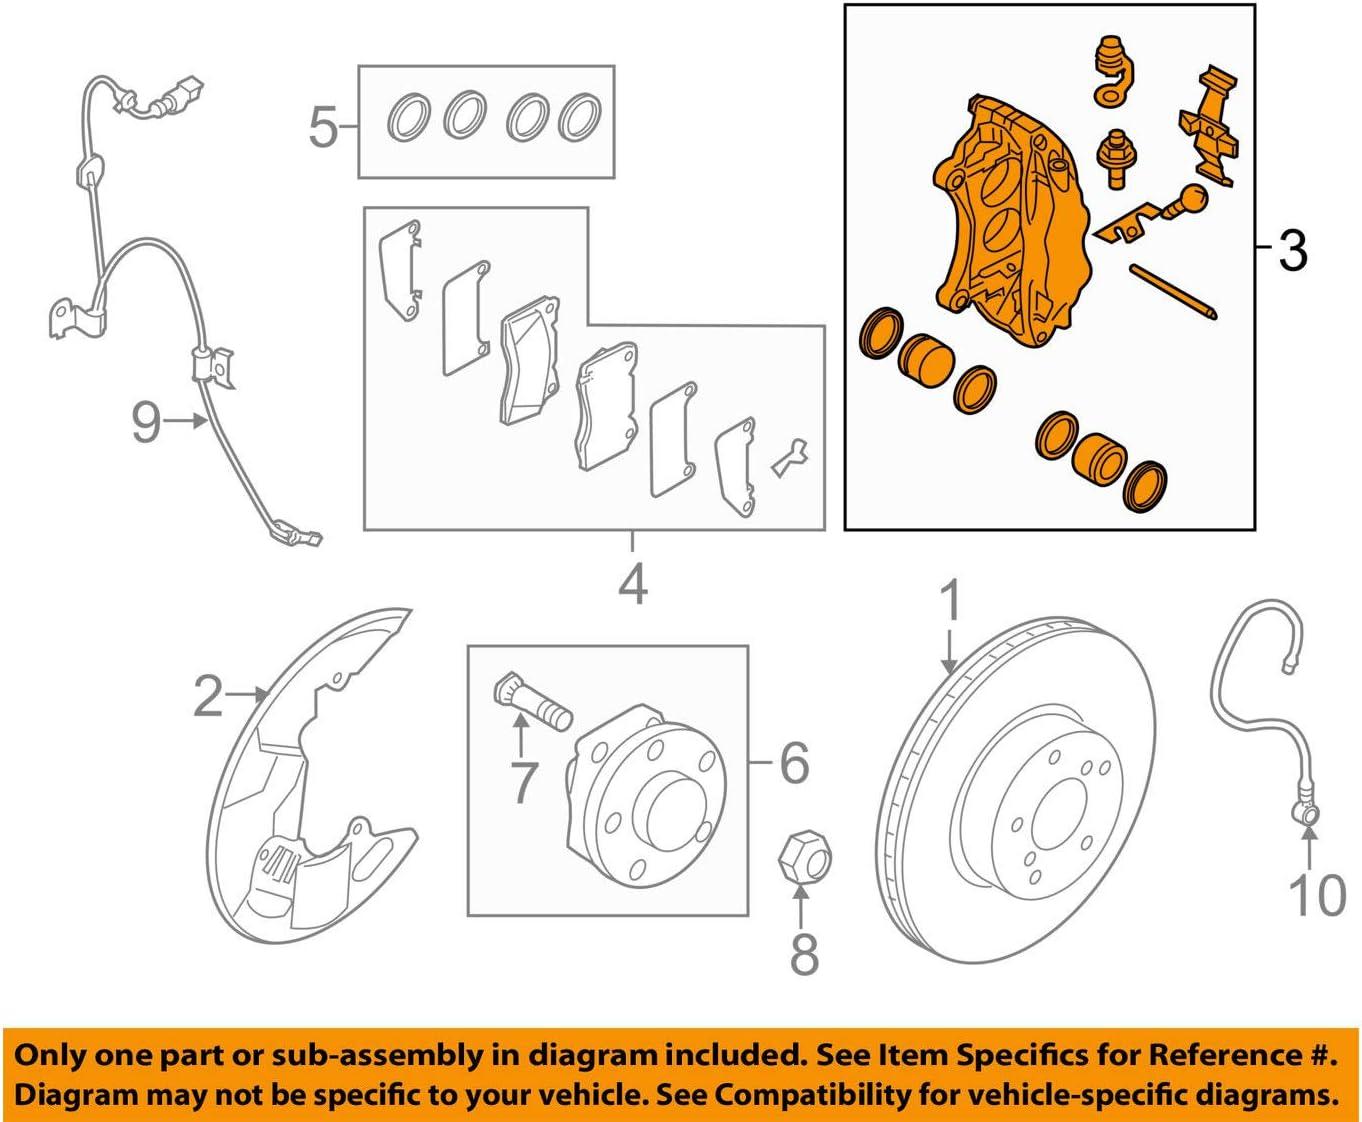 amazon.com: 08-17 subaru impreza wrx sti front left disc brake kit oem new  26292fg011: automotive  amazon.com